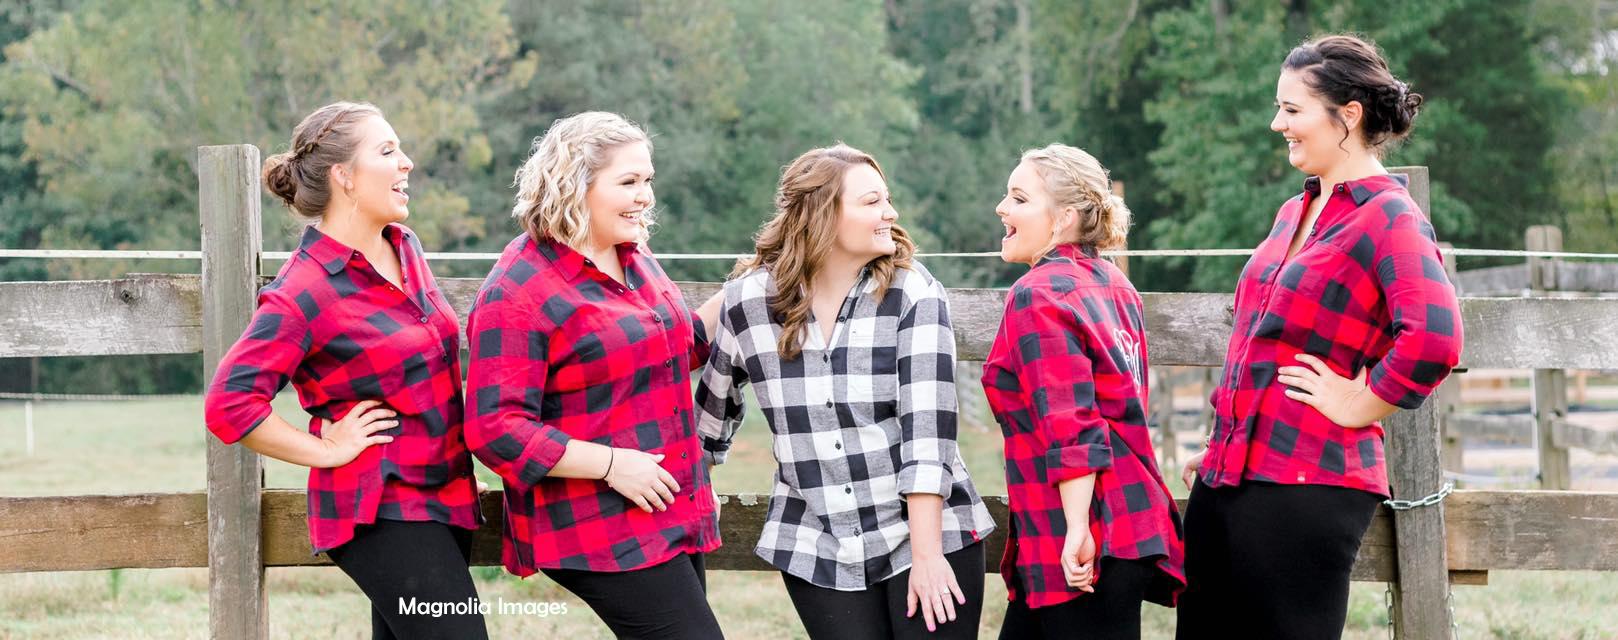 flannel shirts credit.jpg